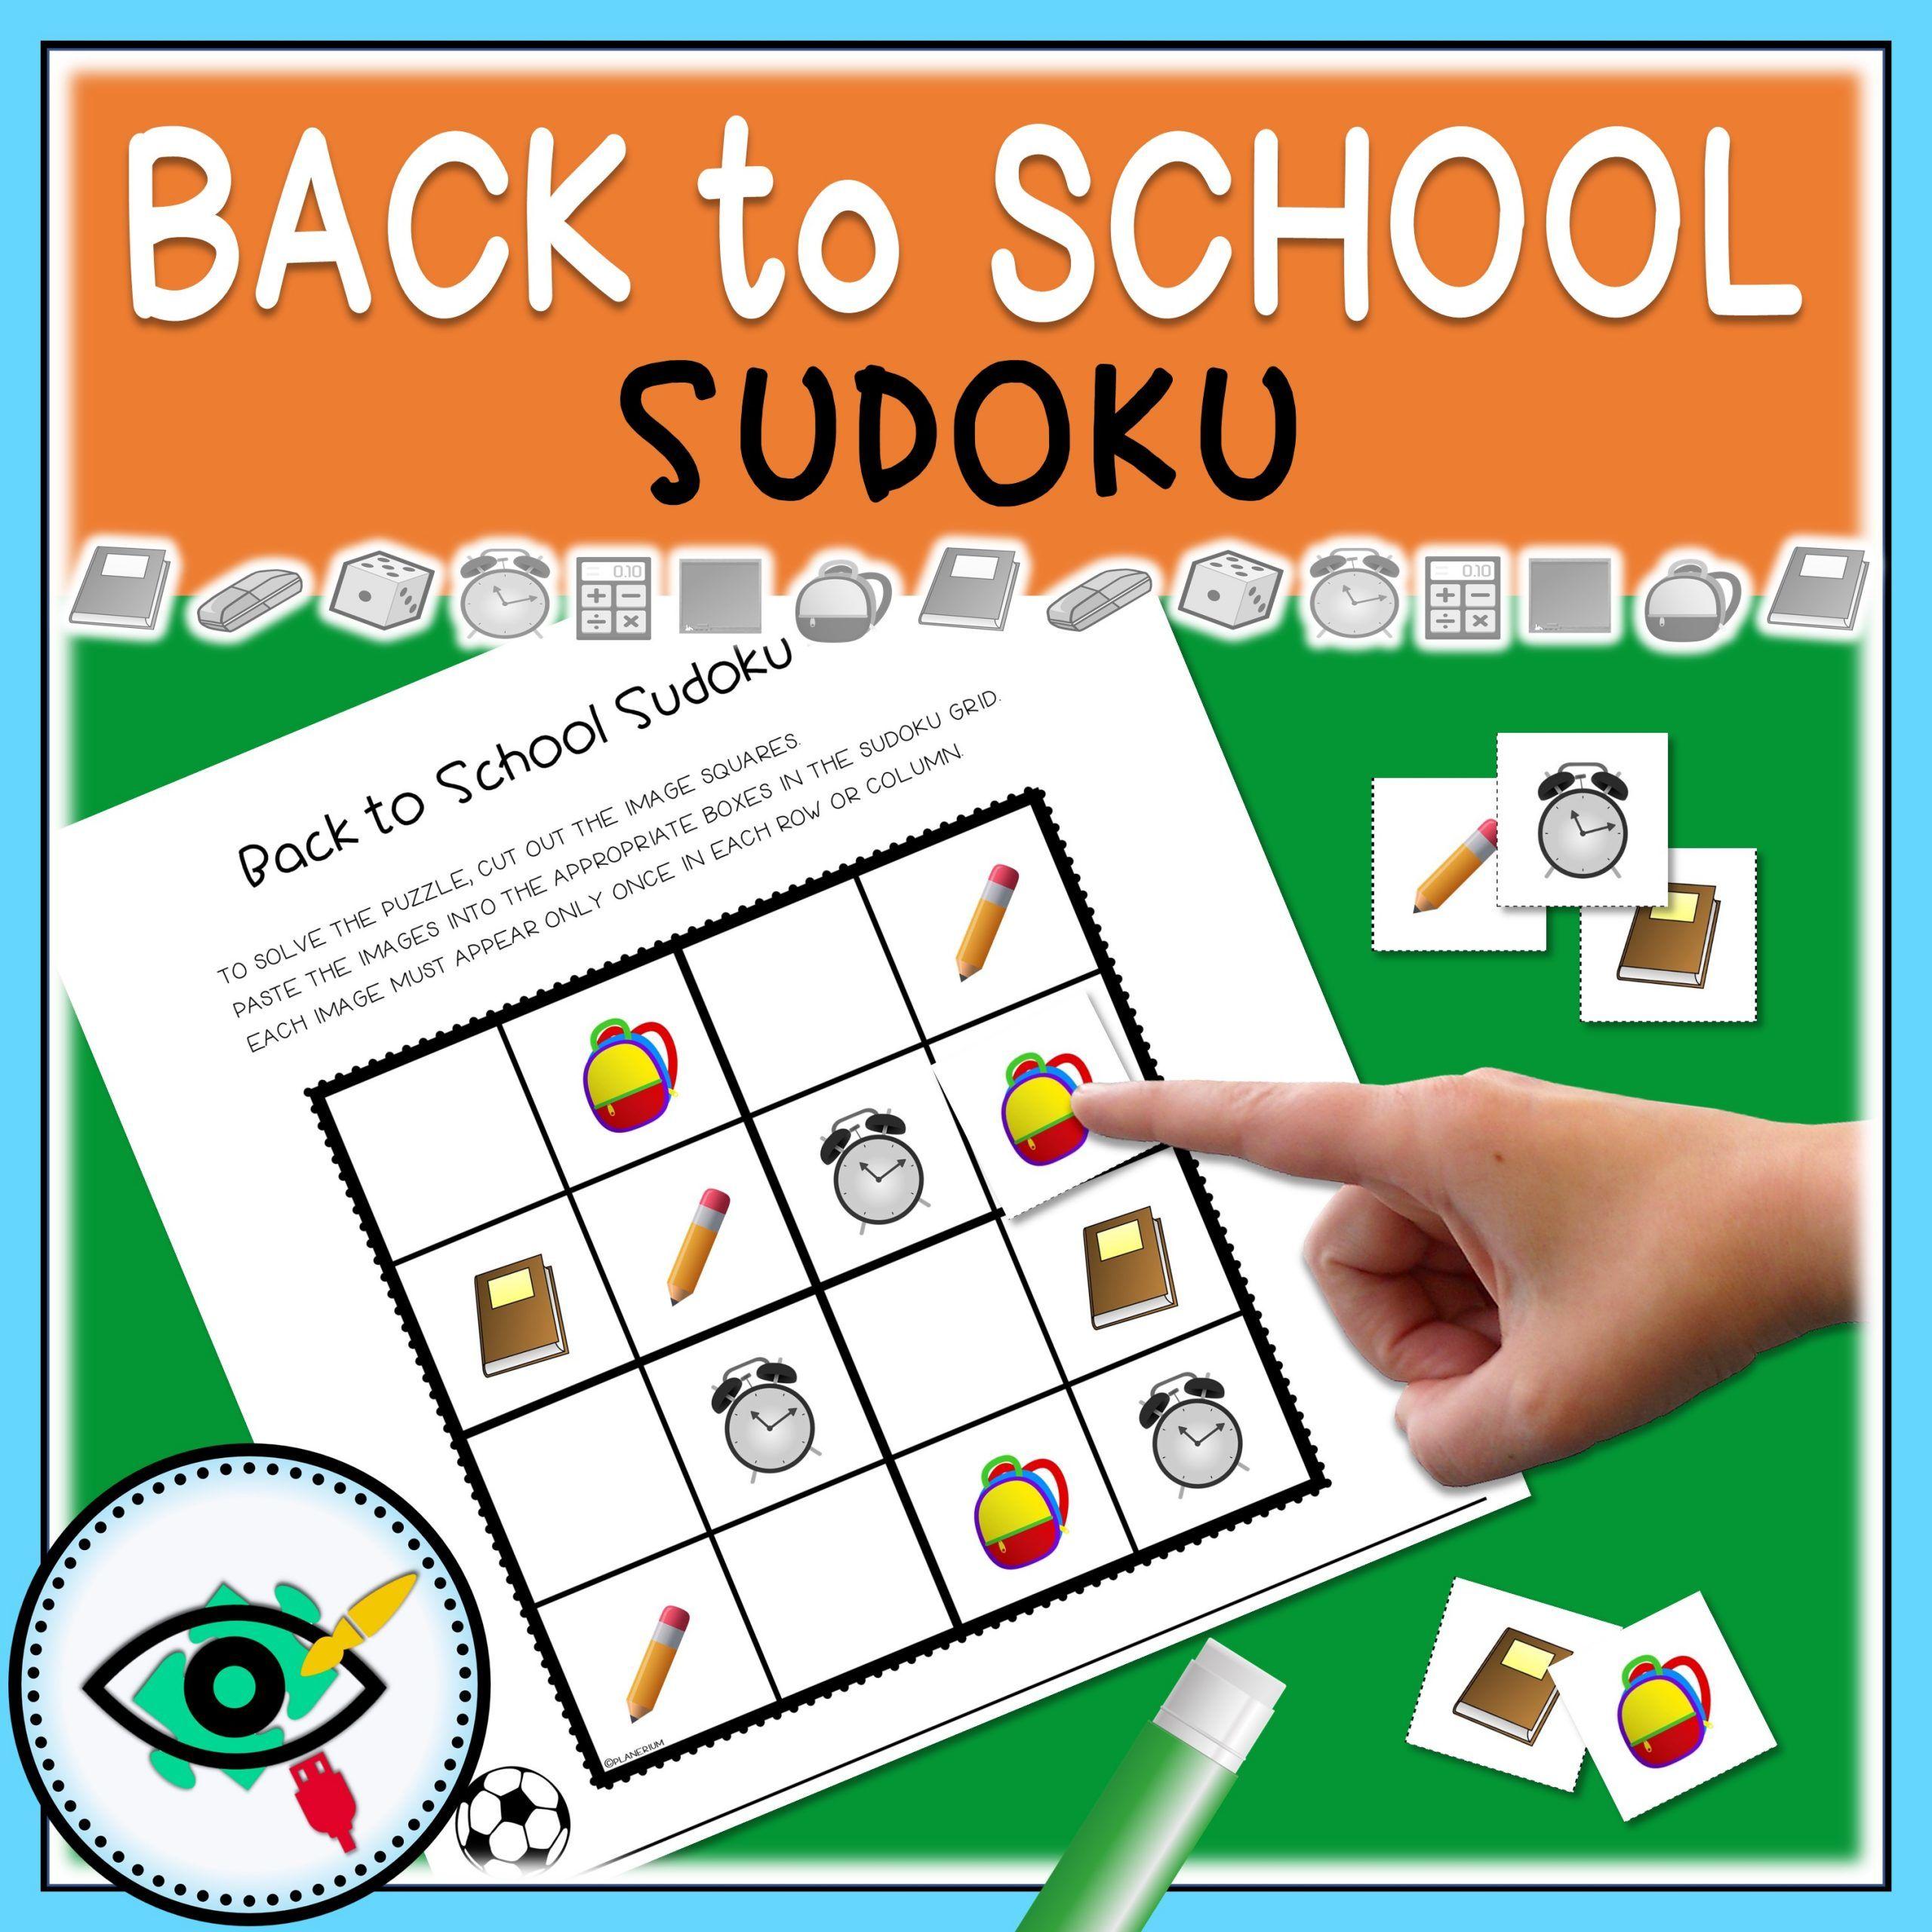 Back to School - Sudoku - Title 5 | Planerium